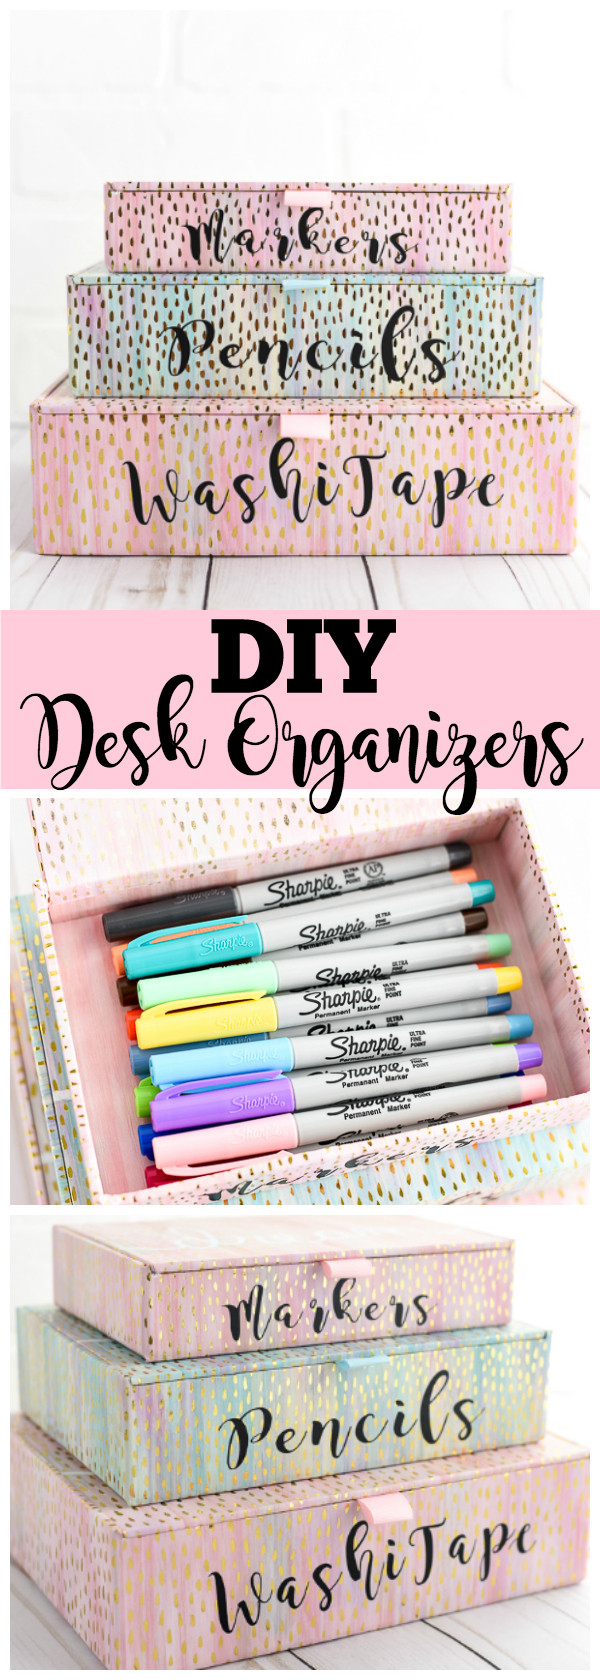 Desk Organization Diy  DIY Desk Organizers